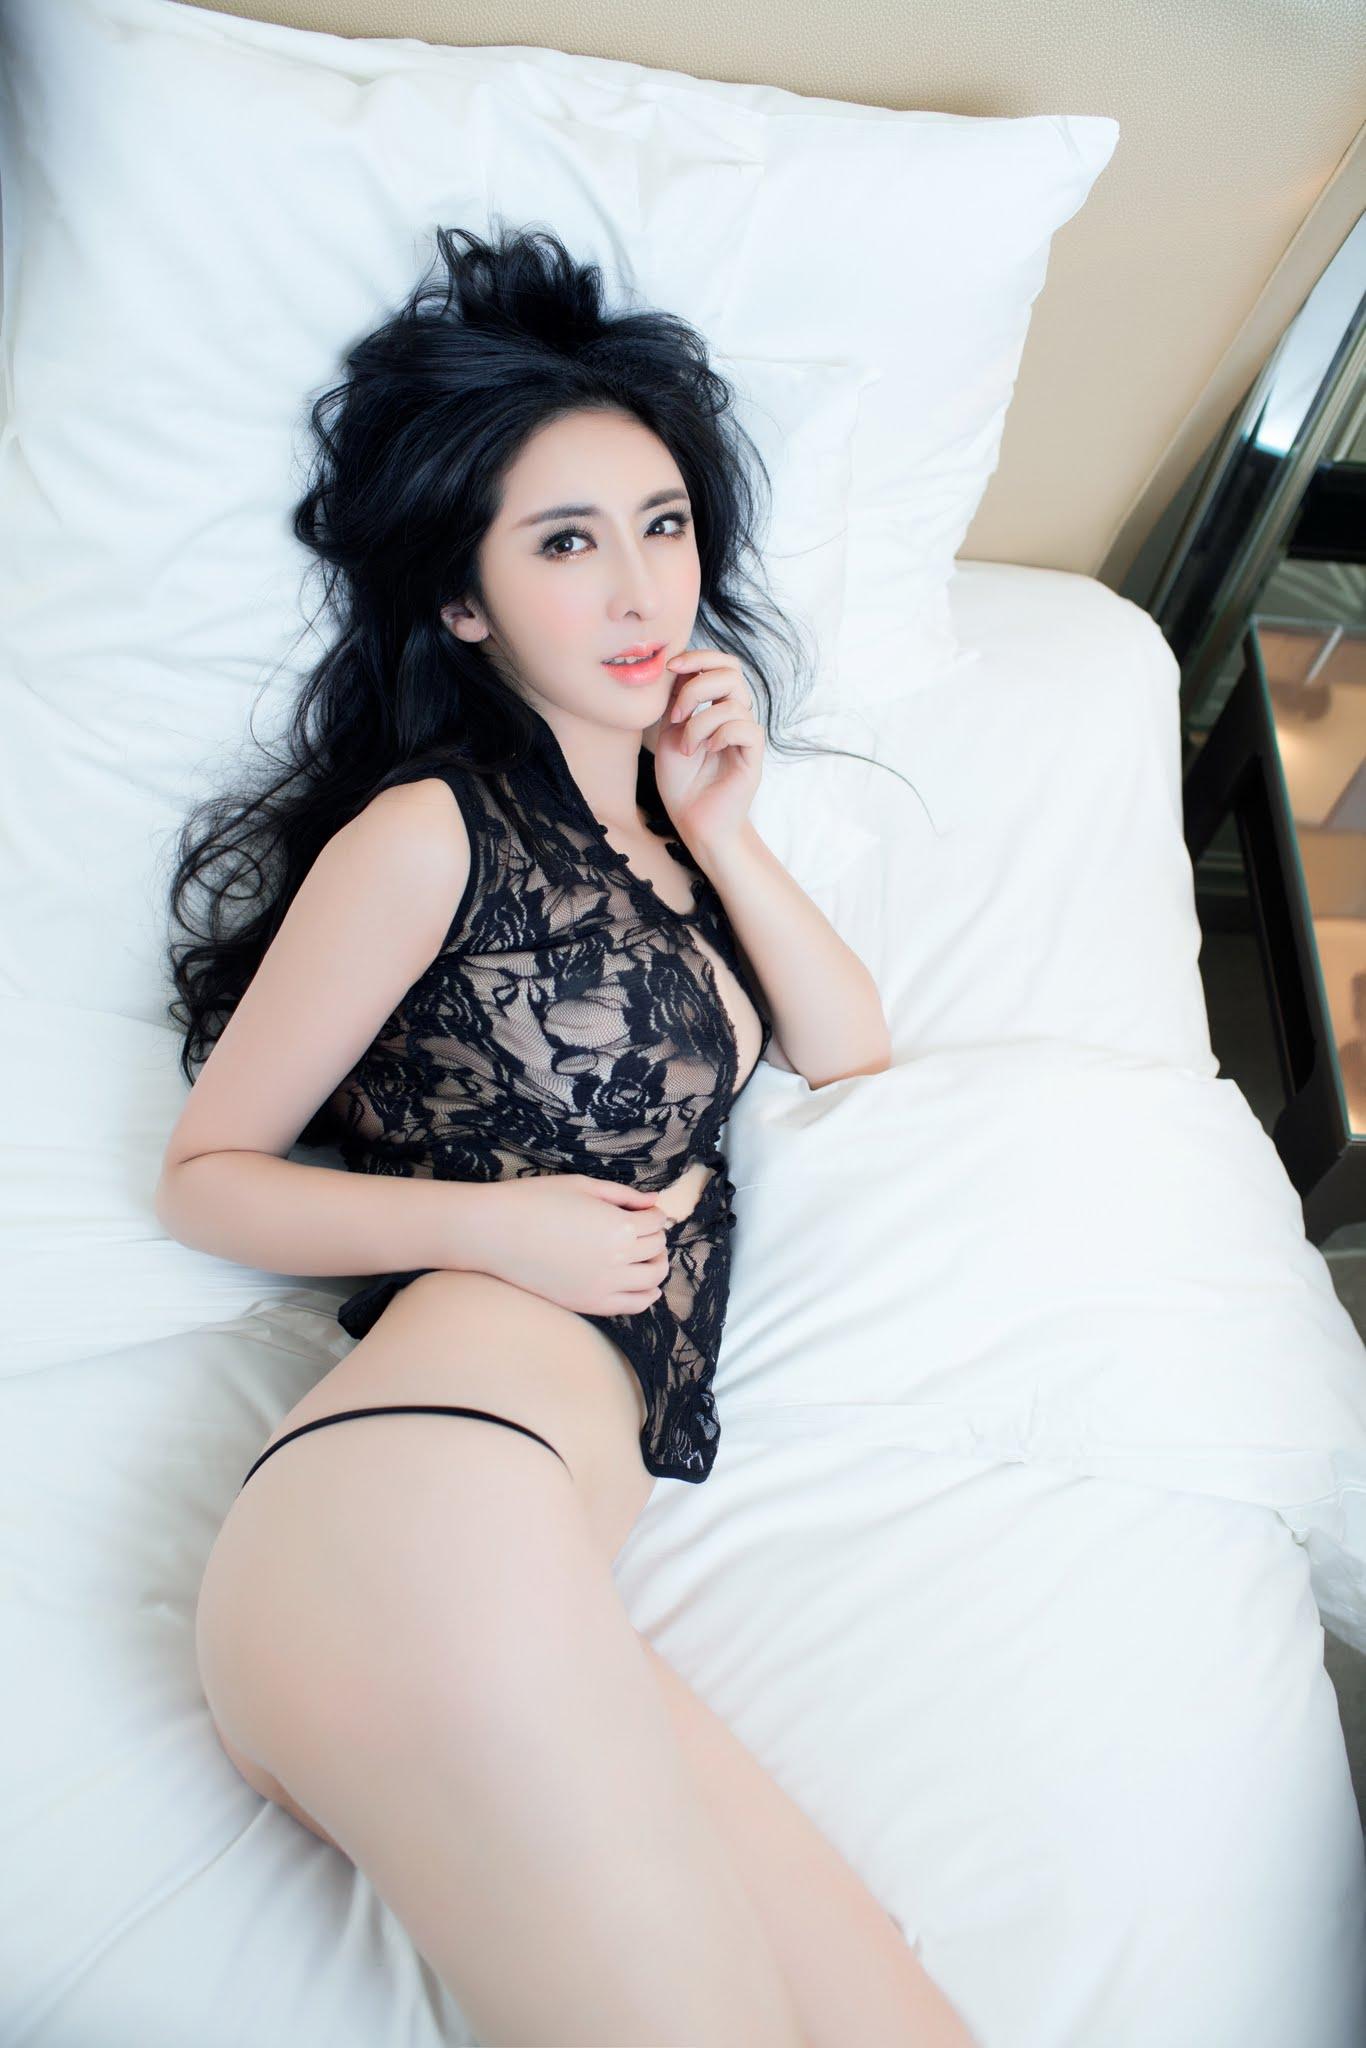 Sexy girl on skype - 4 6